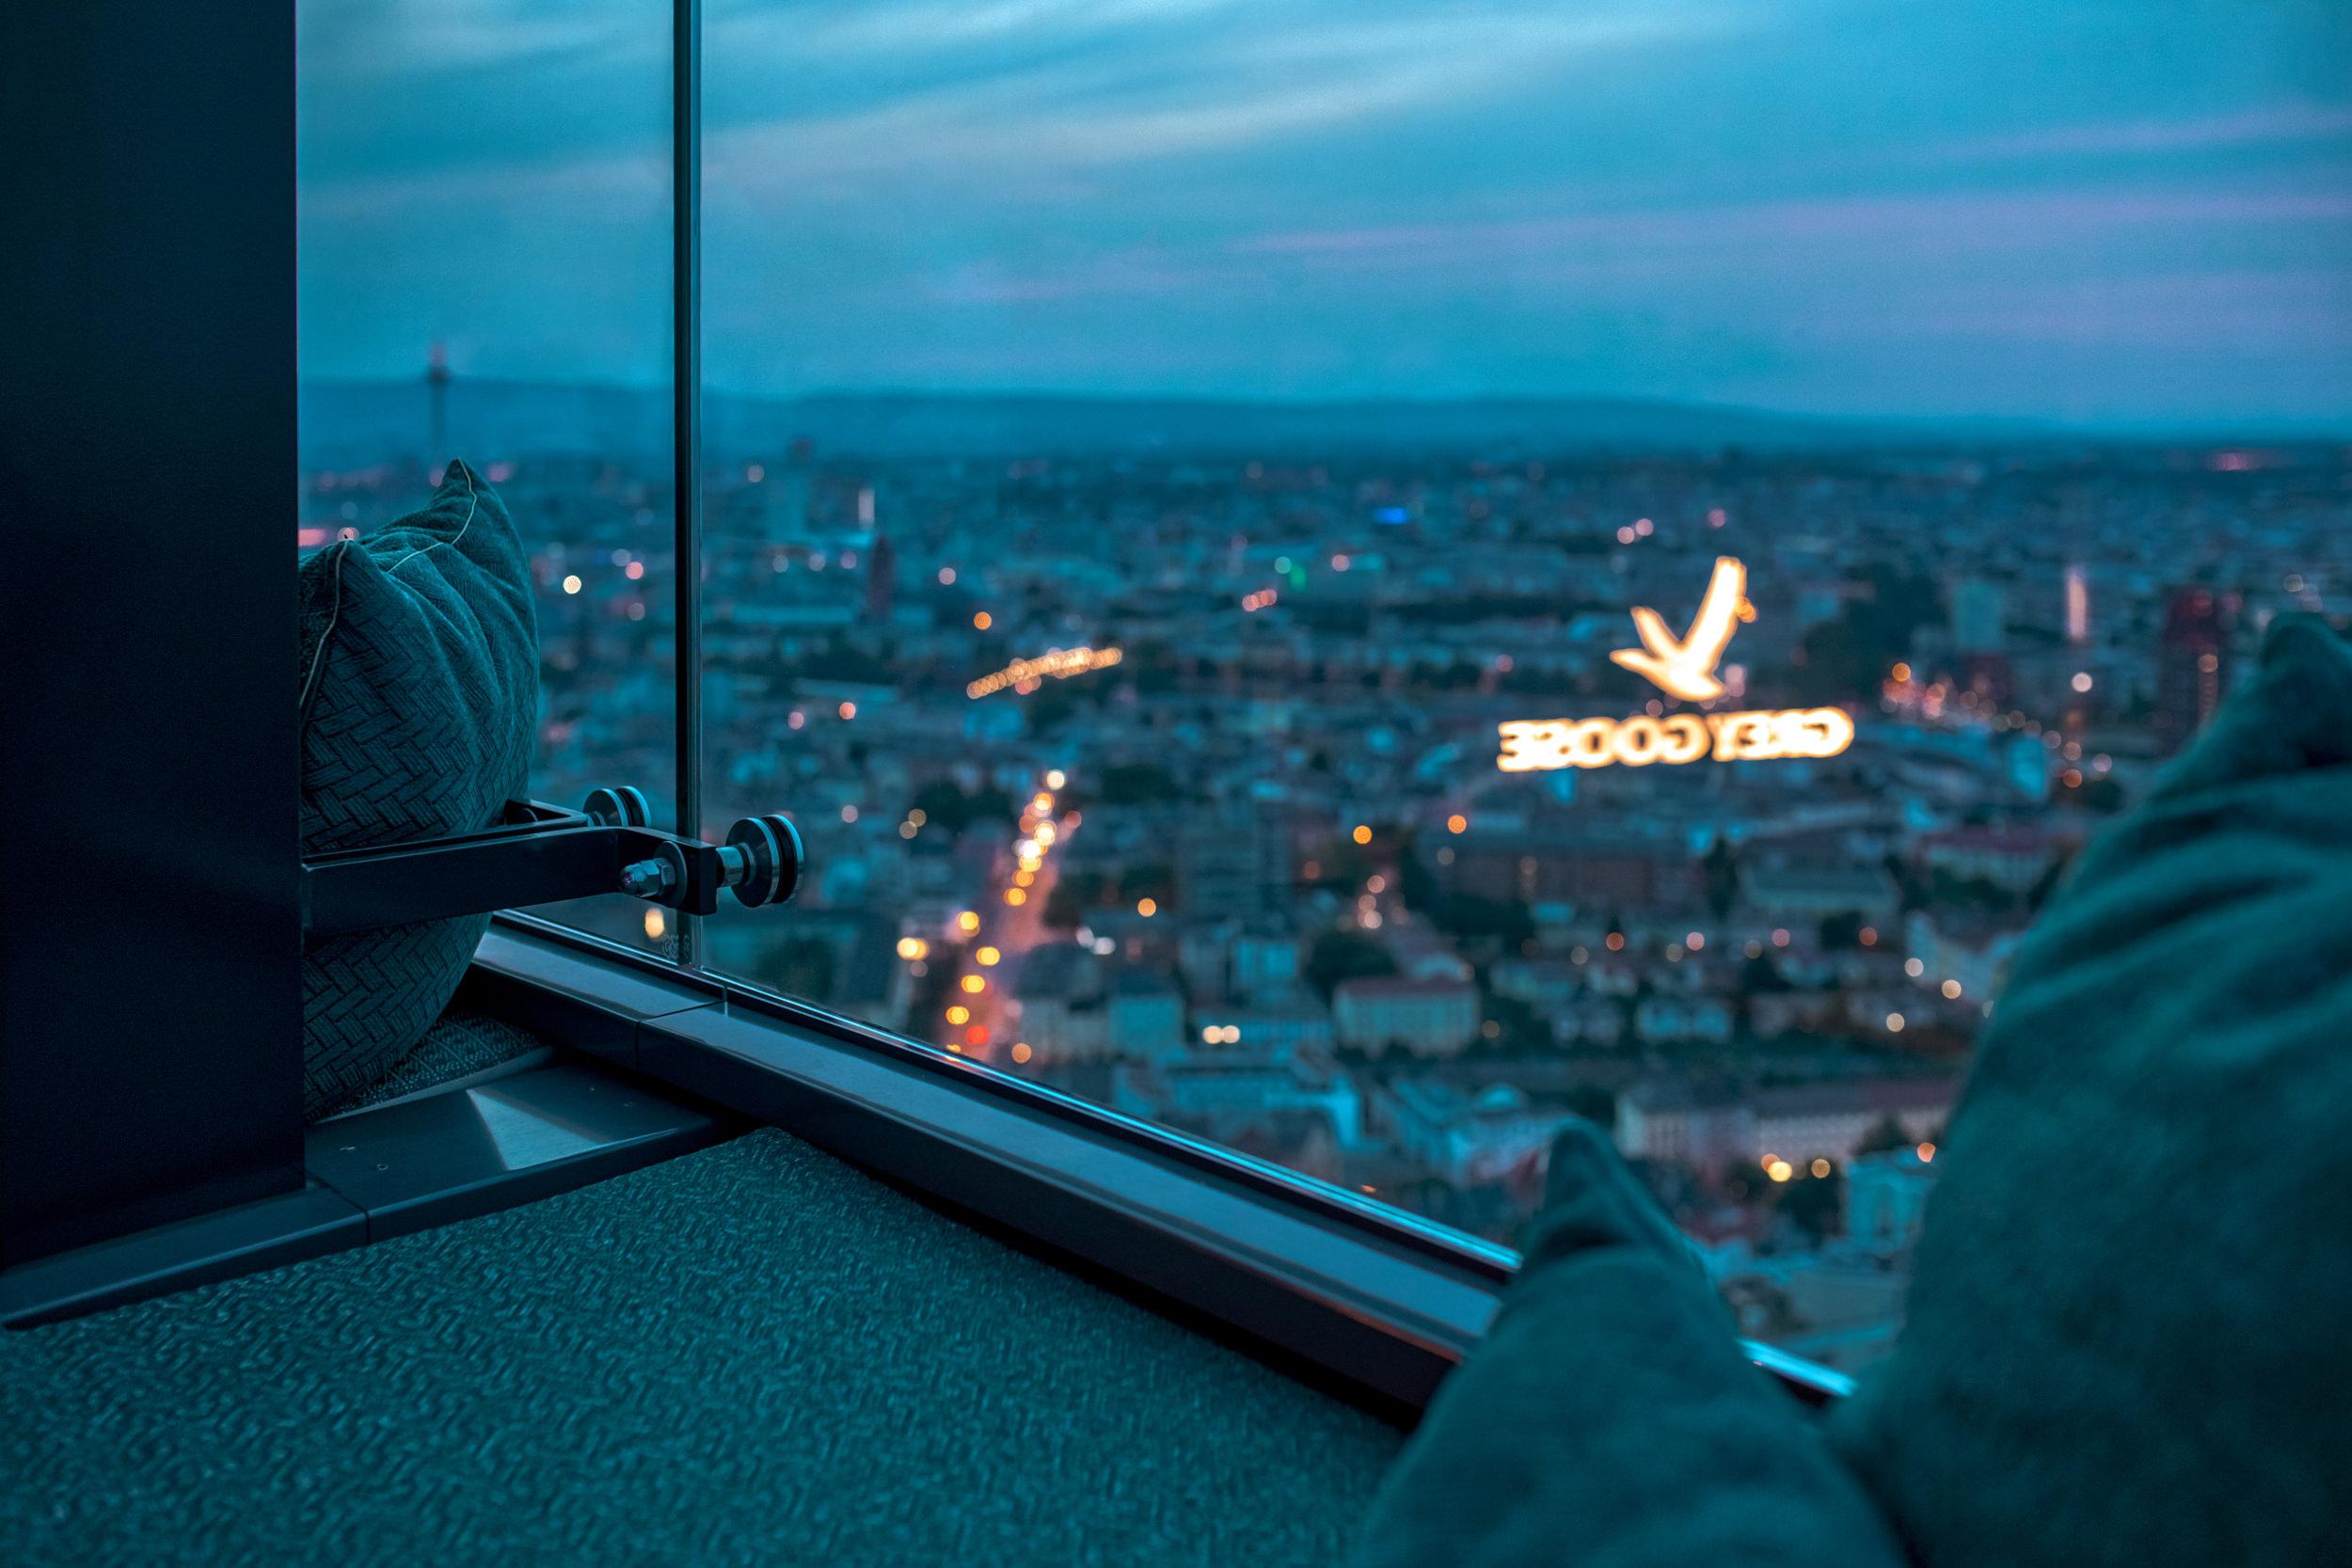 franziska rooftop bar 29